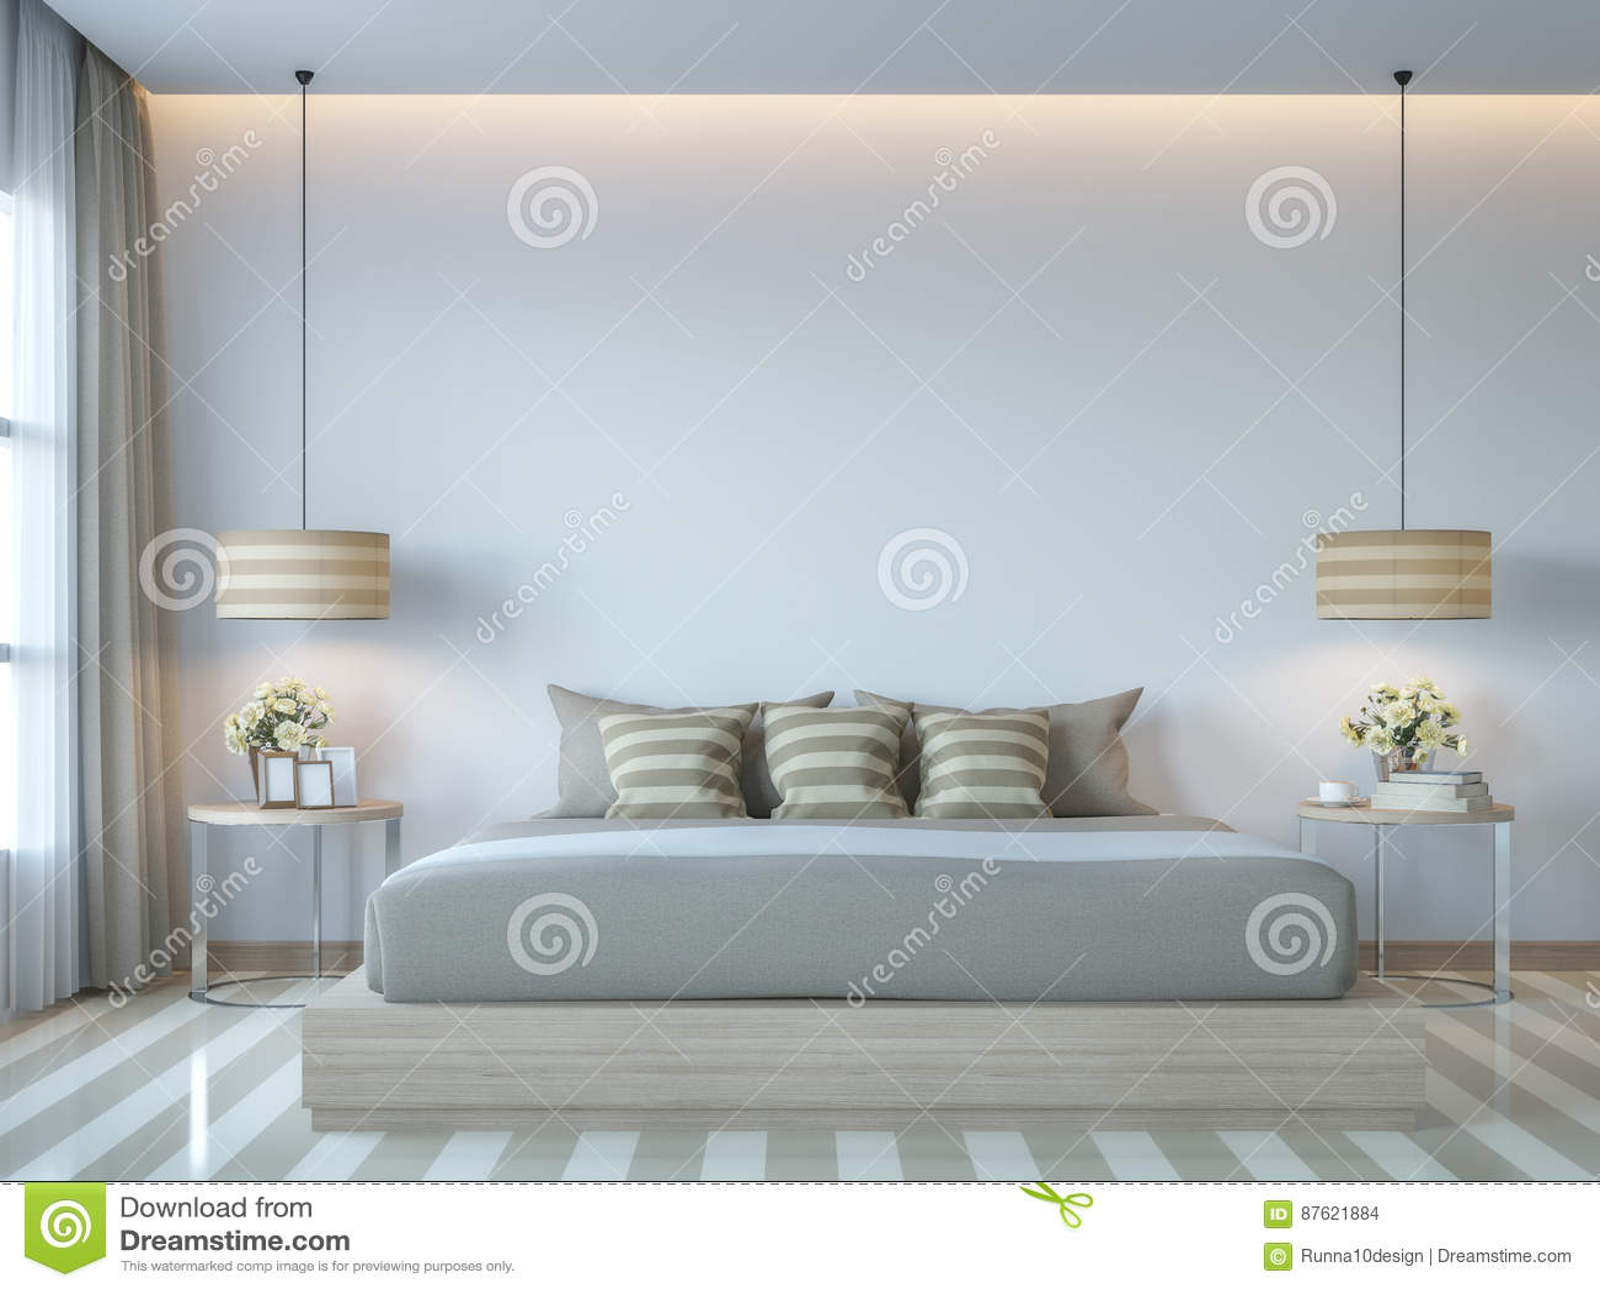 Moderne Witte Slaapkamer : Het moderne witte d teruggevende beeld van de slaapkamer minimale